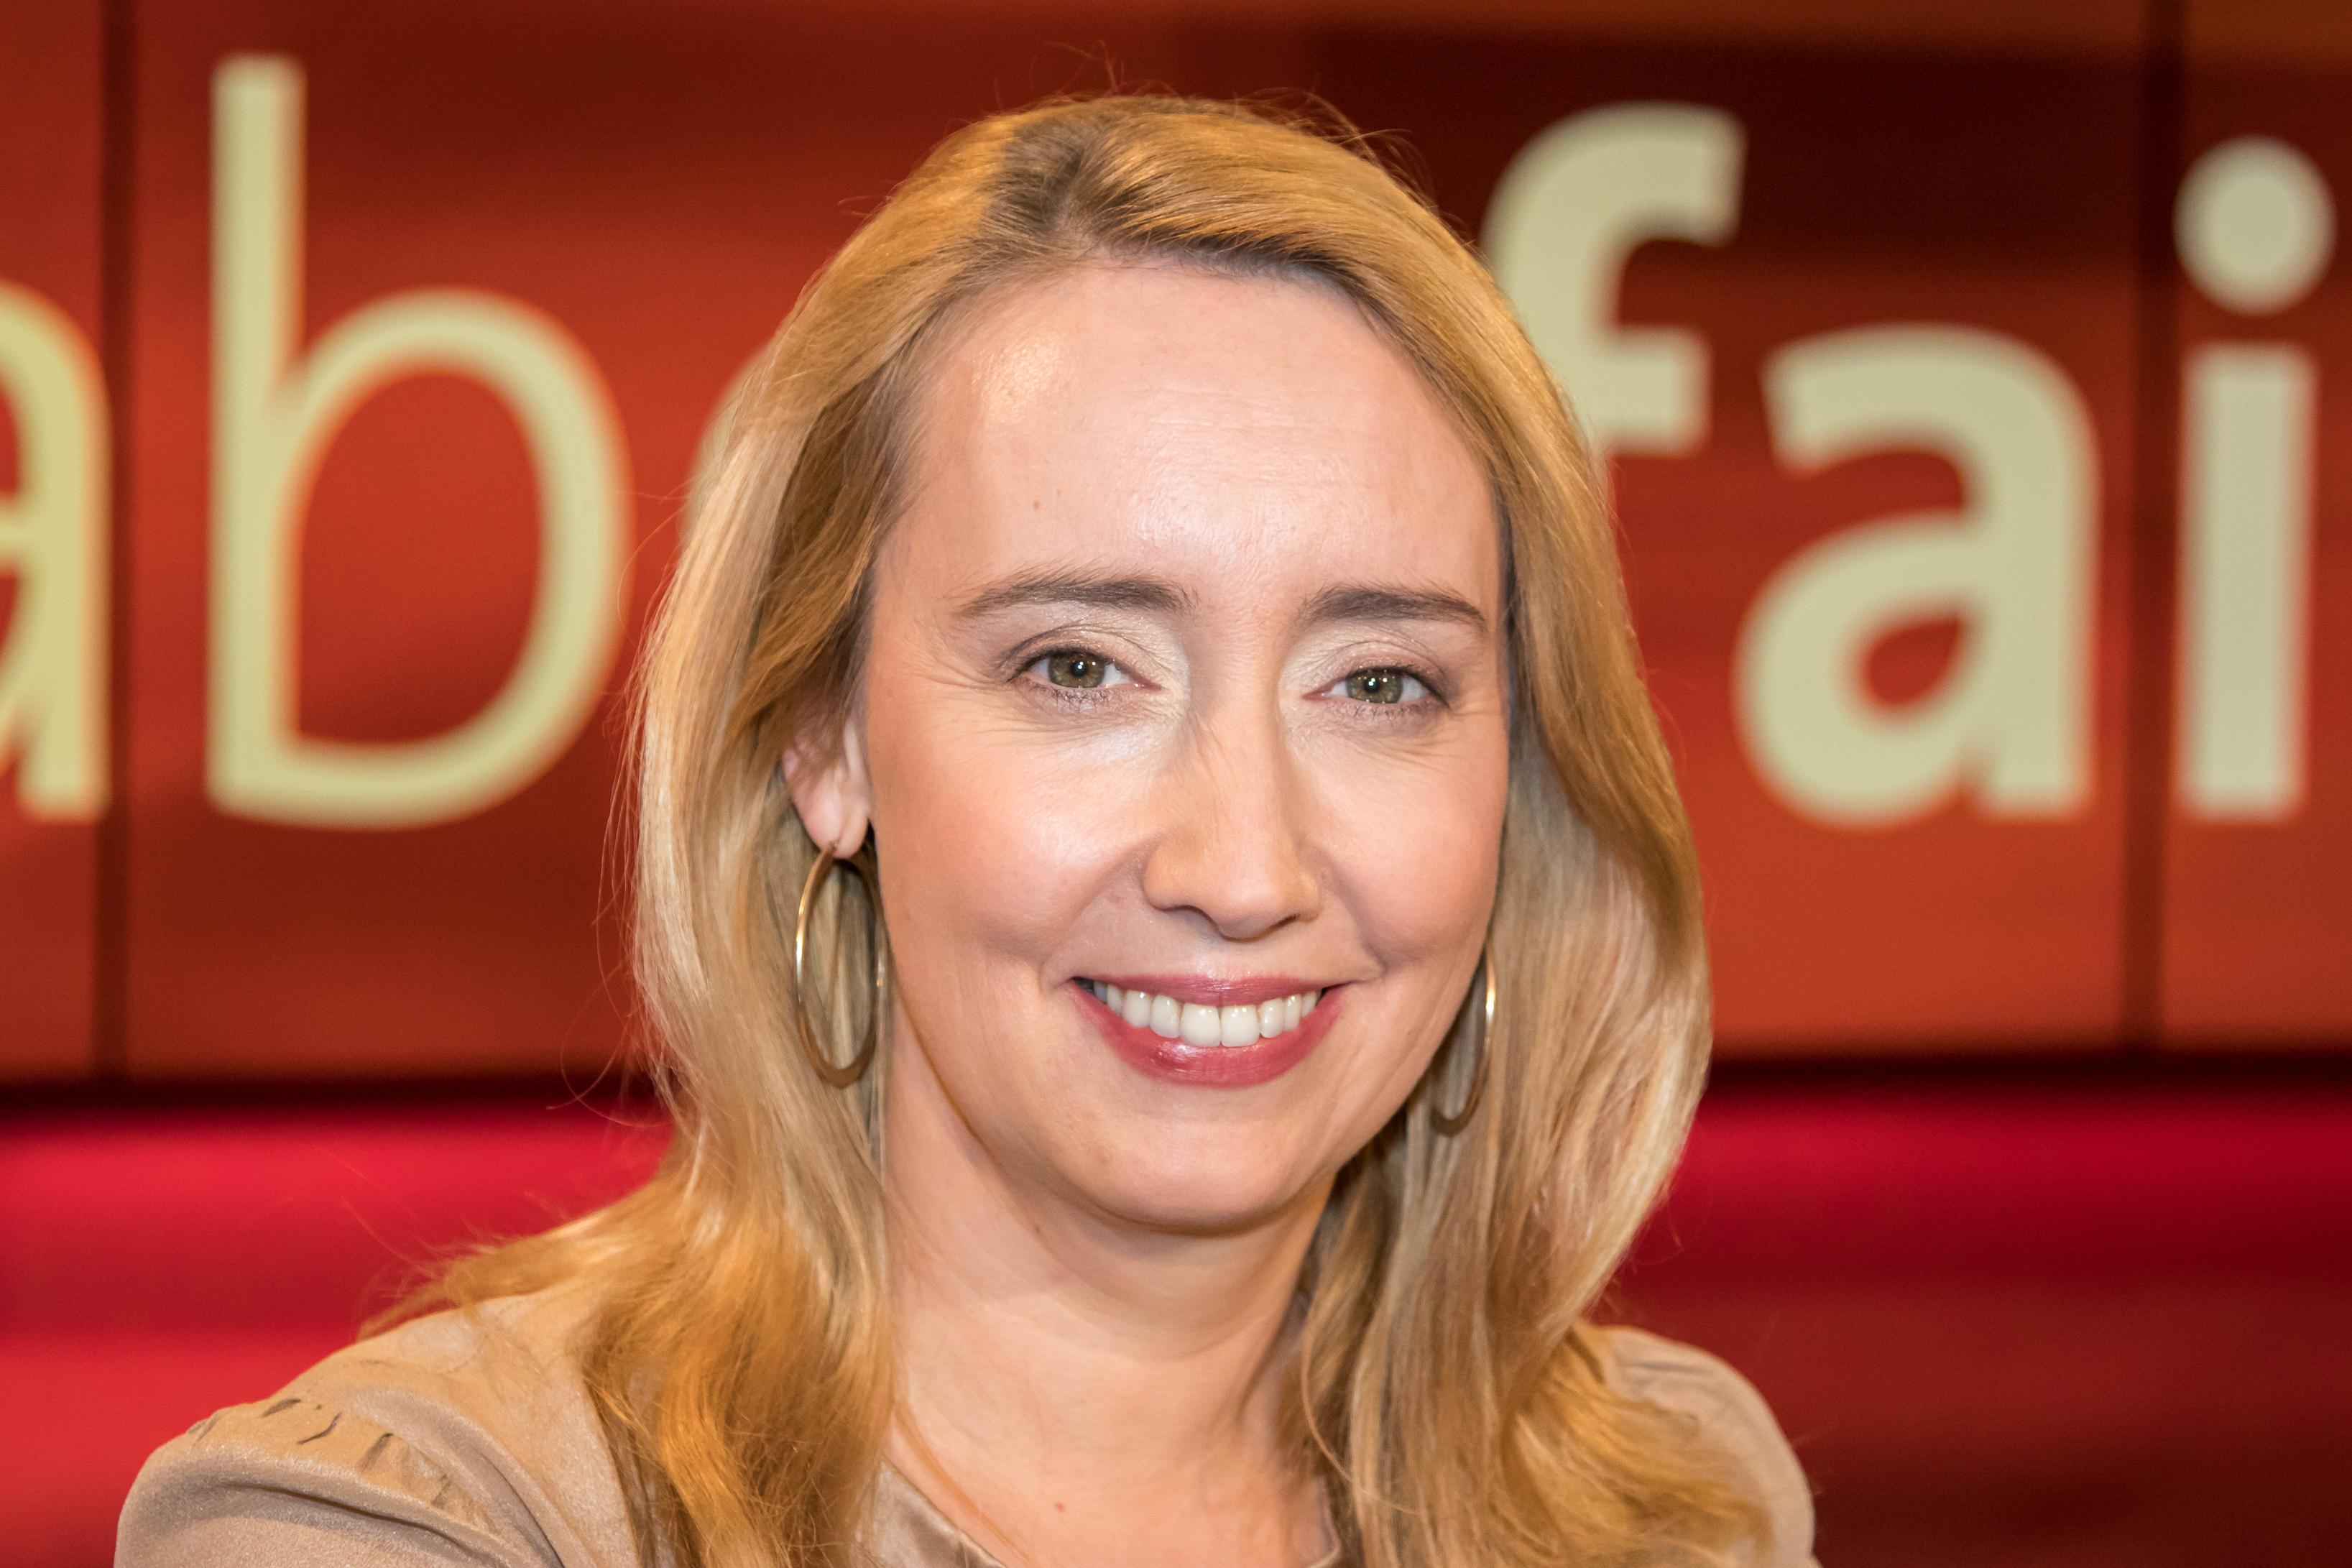 Melanie Ammann